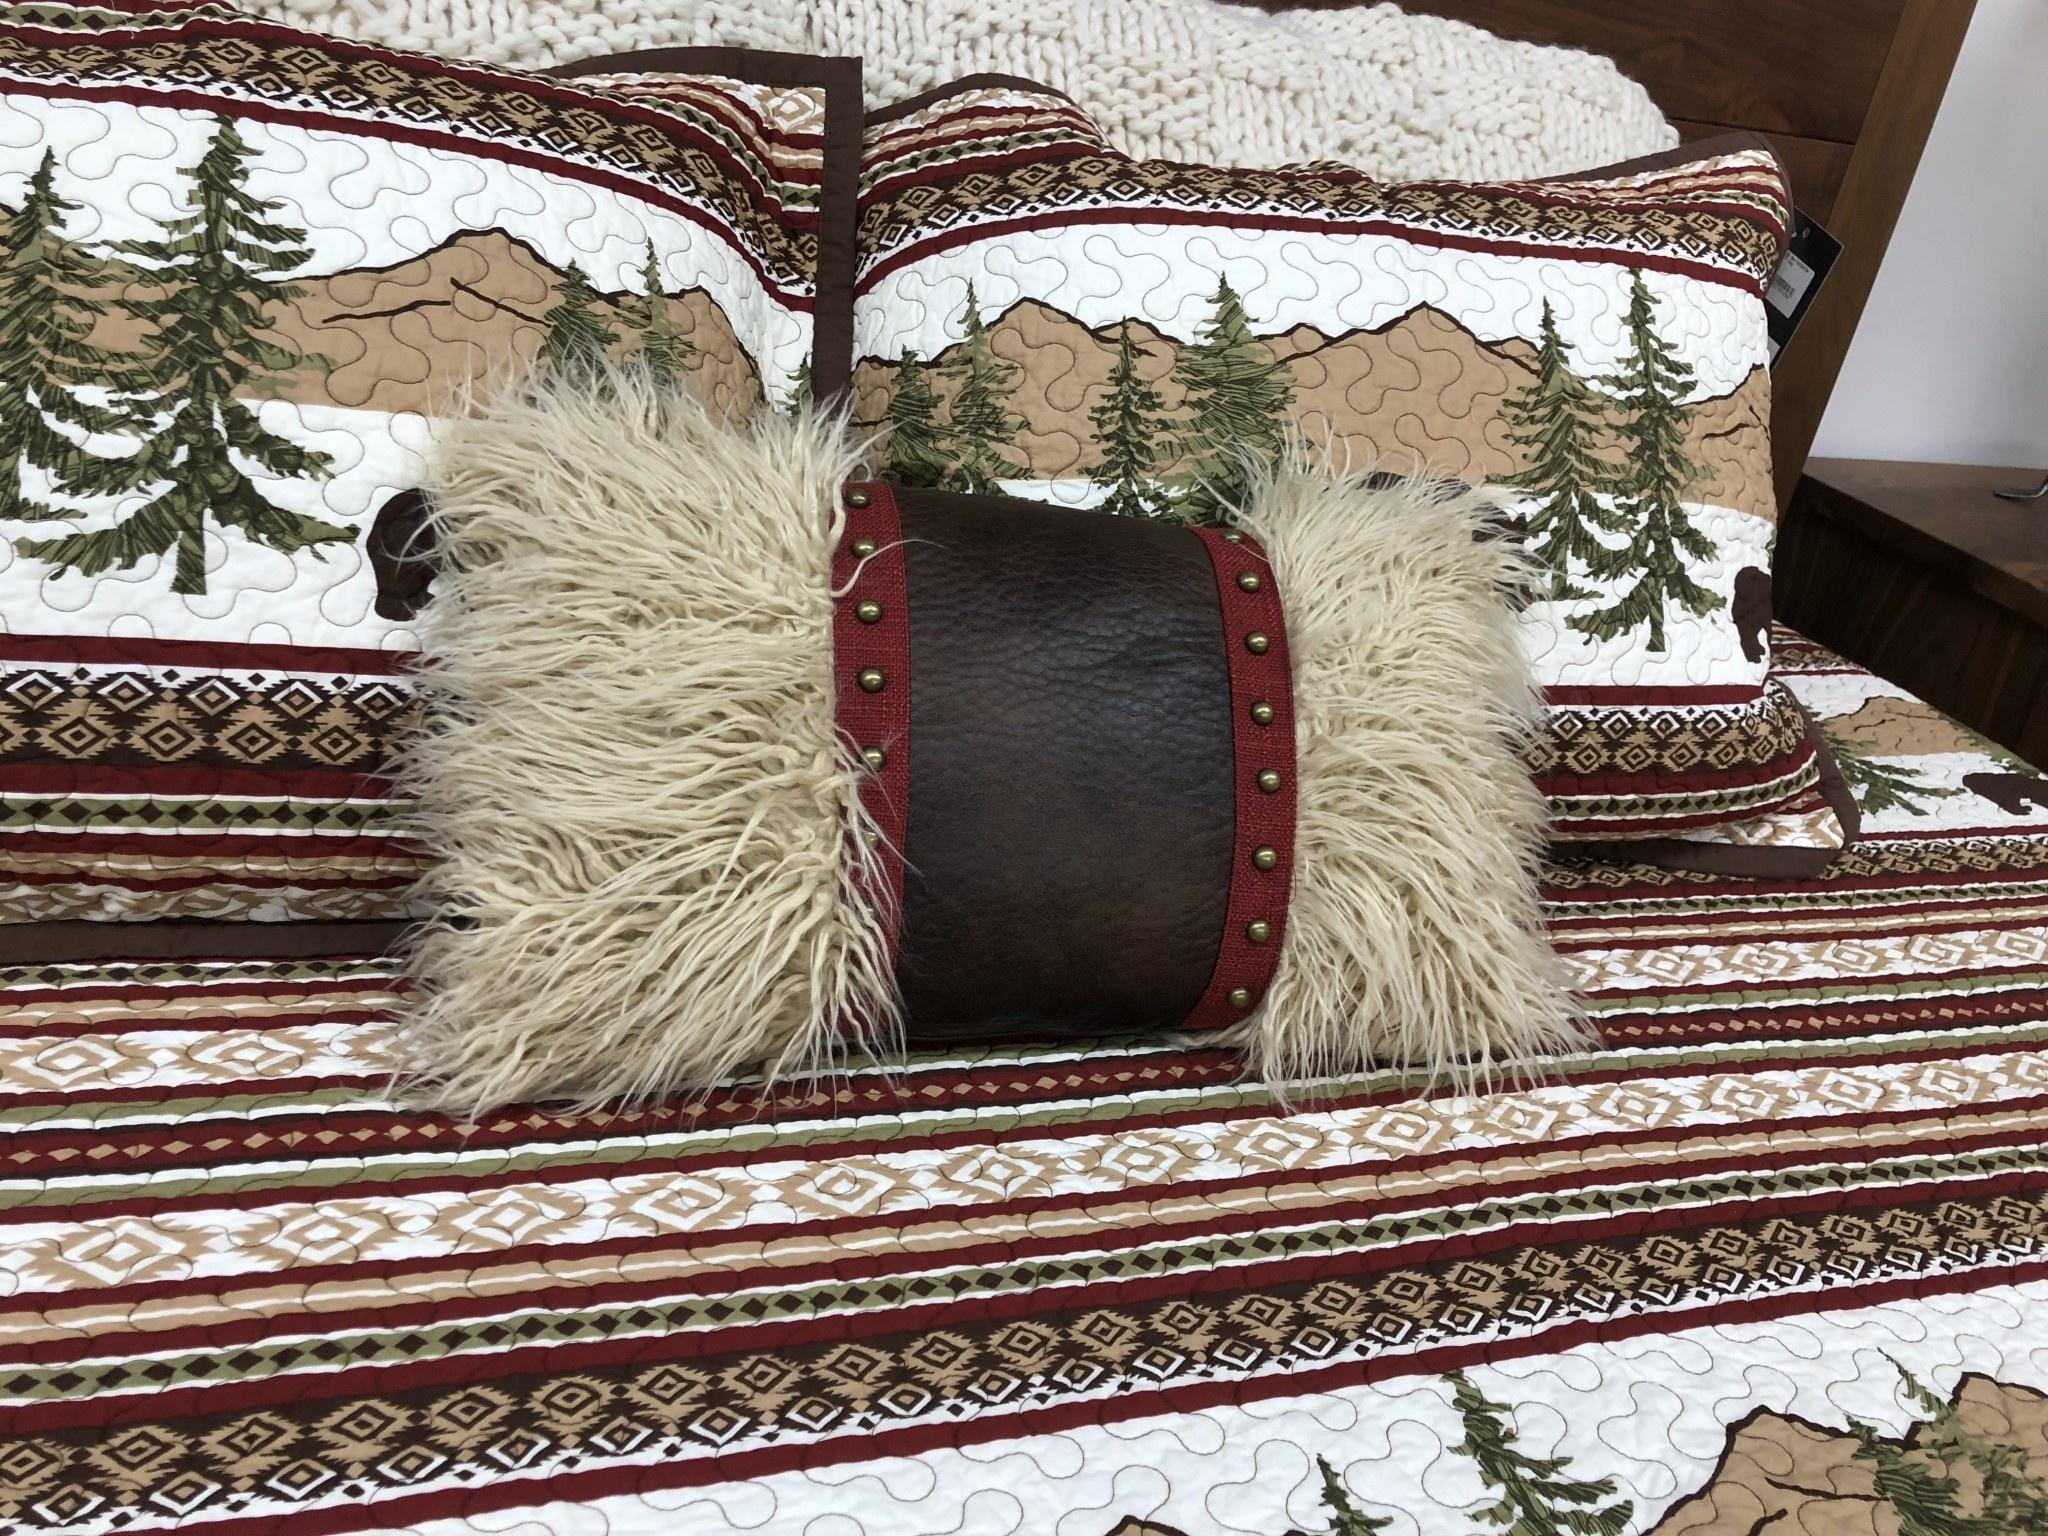 Hiend Ruidoso Fur Pillow w/leather & studs12x19,